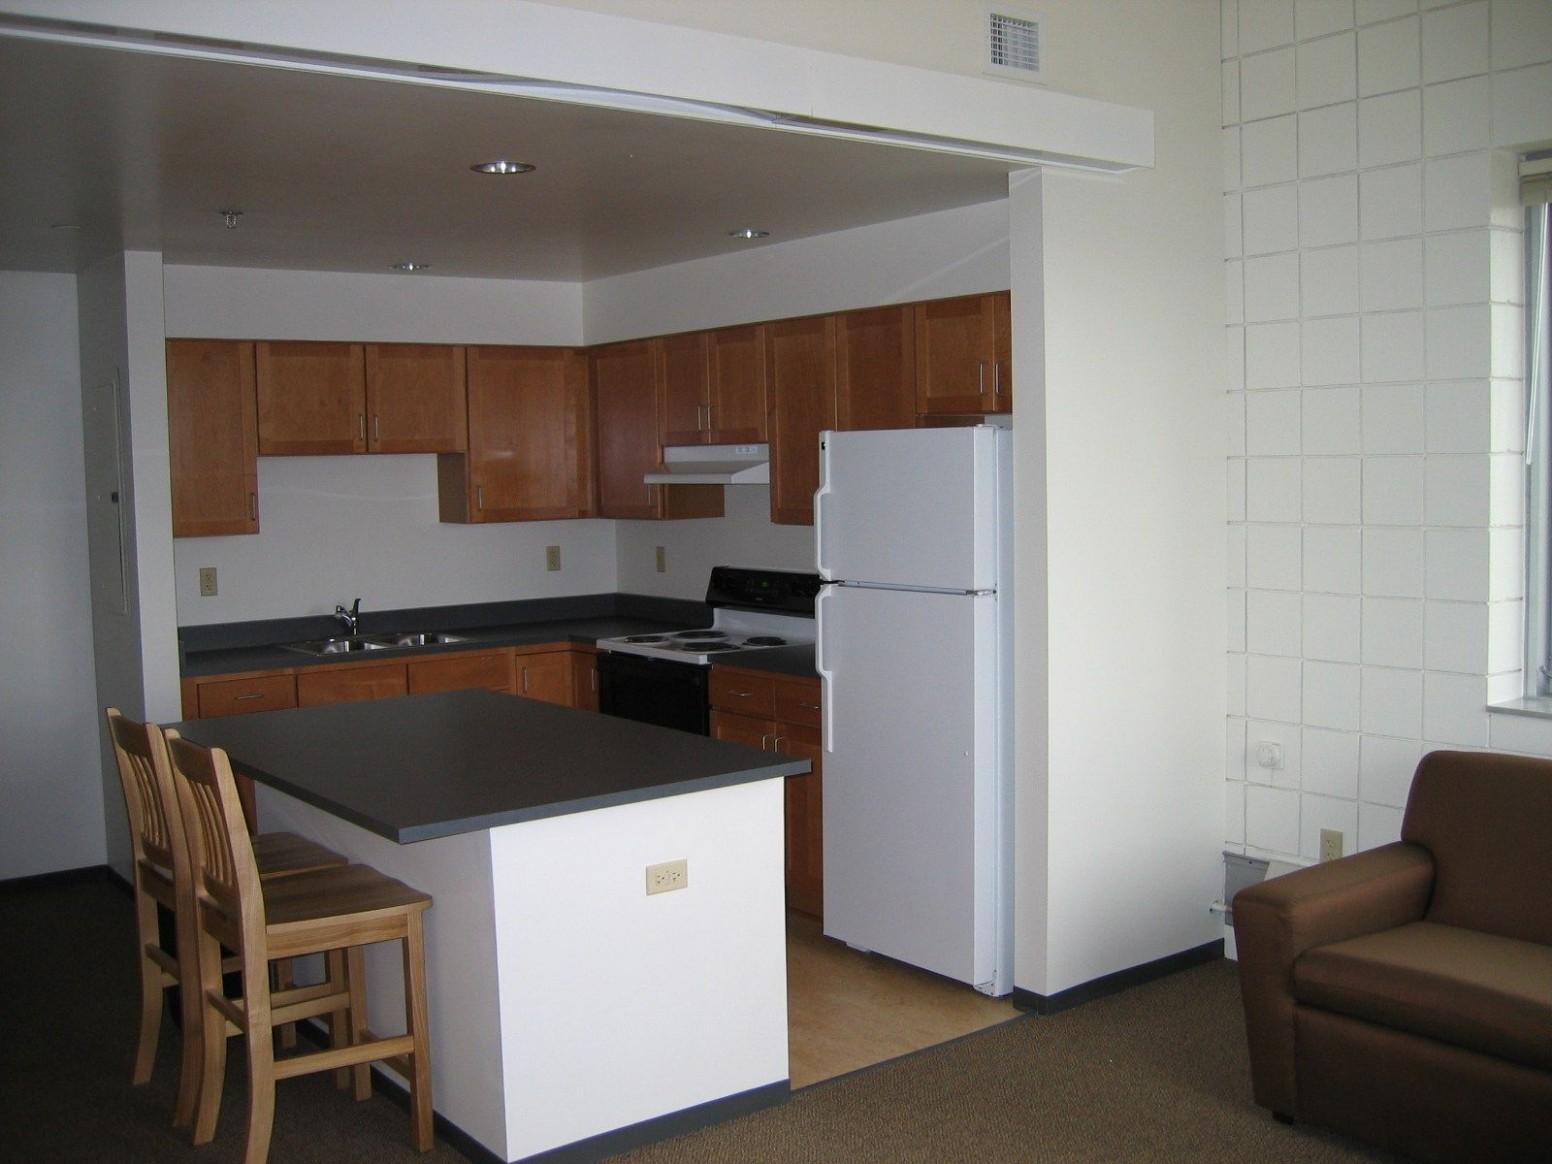 10 Idea Dekorasi Dapur Untuk Apartment Dan Kondominium Yang Kecil  - Design Apartment Kecil